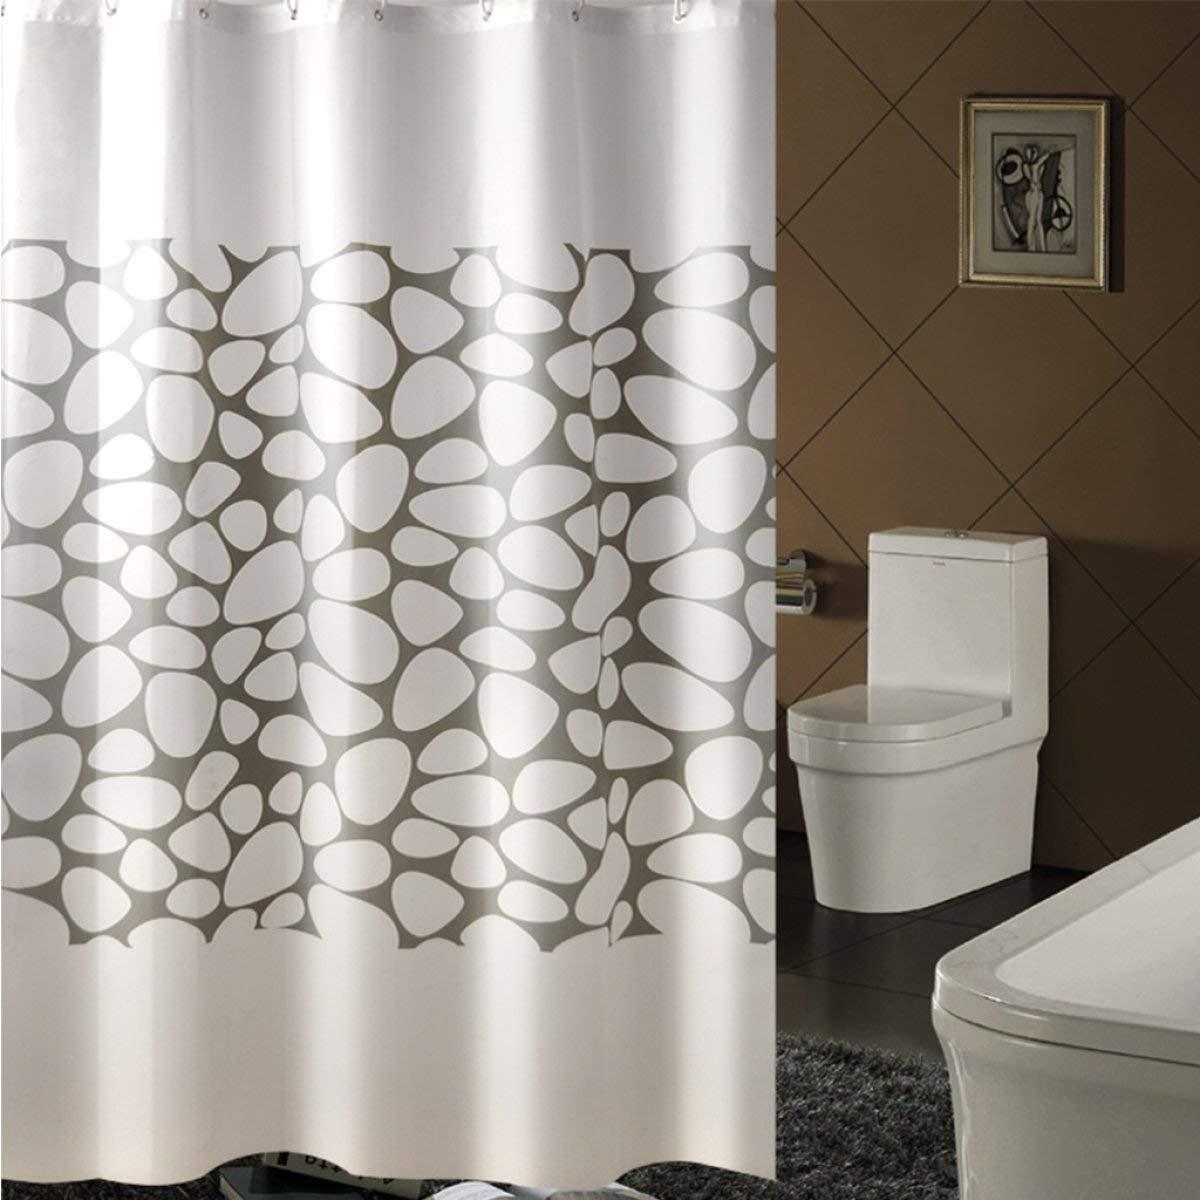 Der Creative Wild Snowflake Opaque Sunshade Padded EVA Bathroom Drilled Shower Curtain Waterproof Mildew Bathroom Accessories (Size : 150cm180cm)